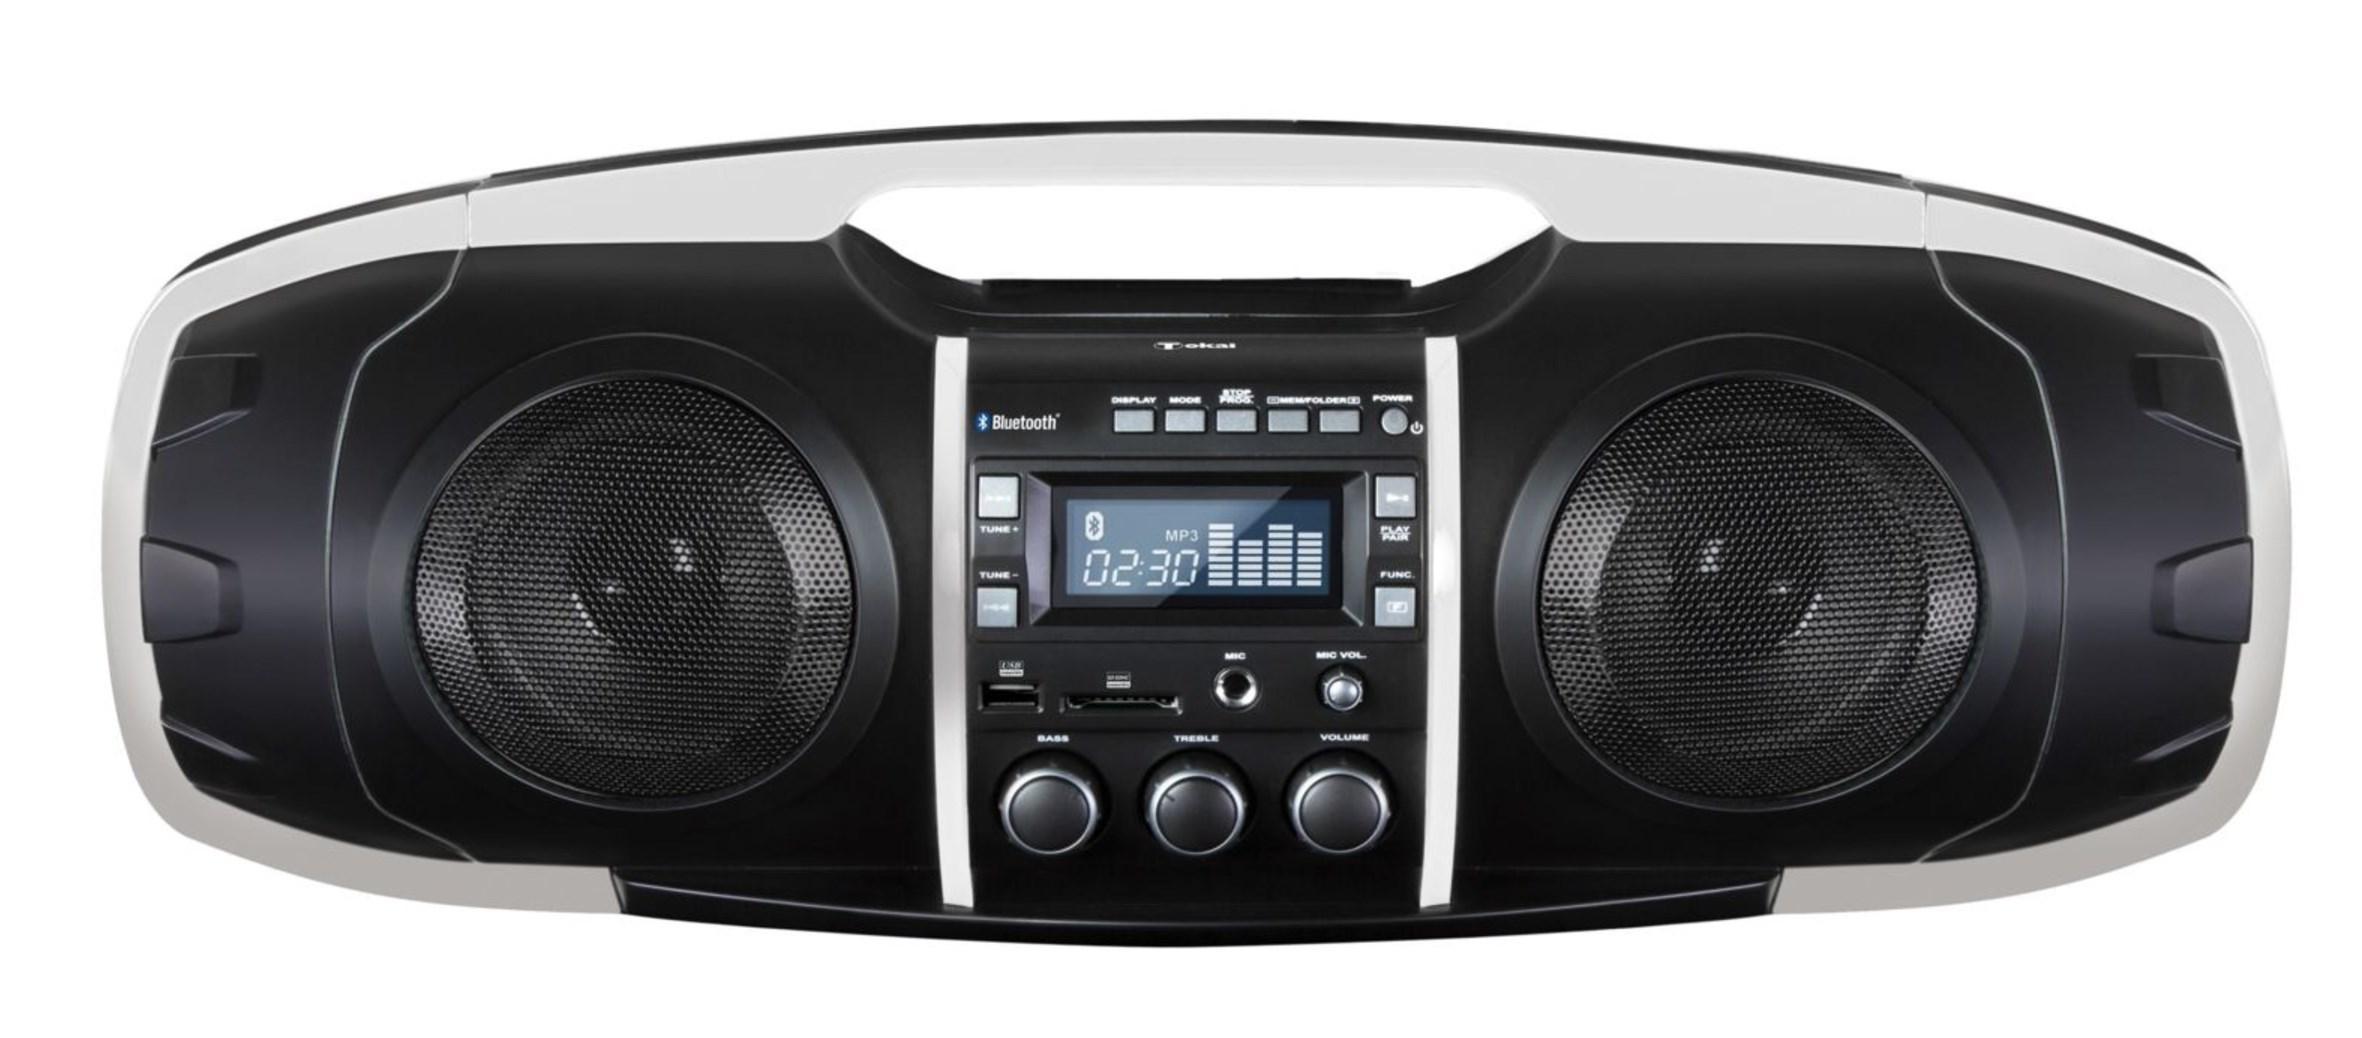 Enceinte portable Tokai Soundblaster GB-6000 - Bluetooth